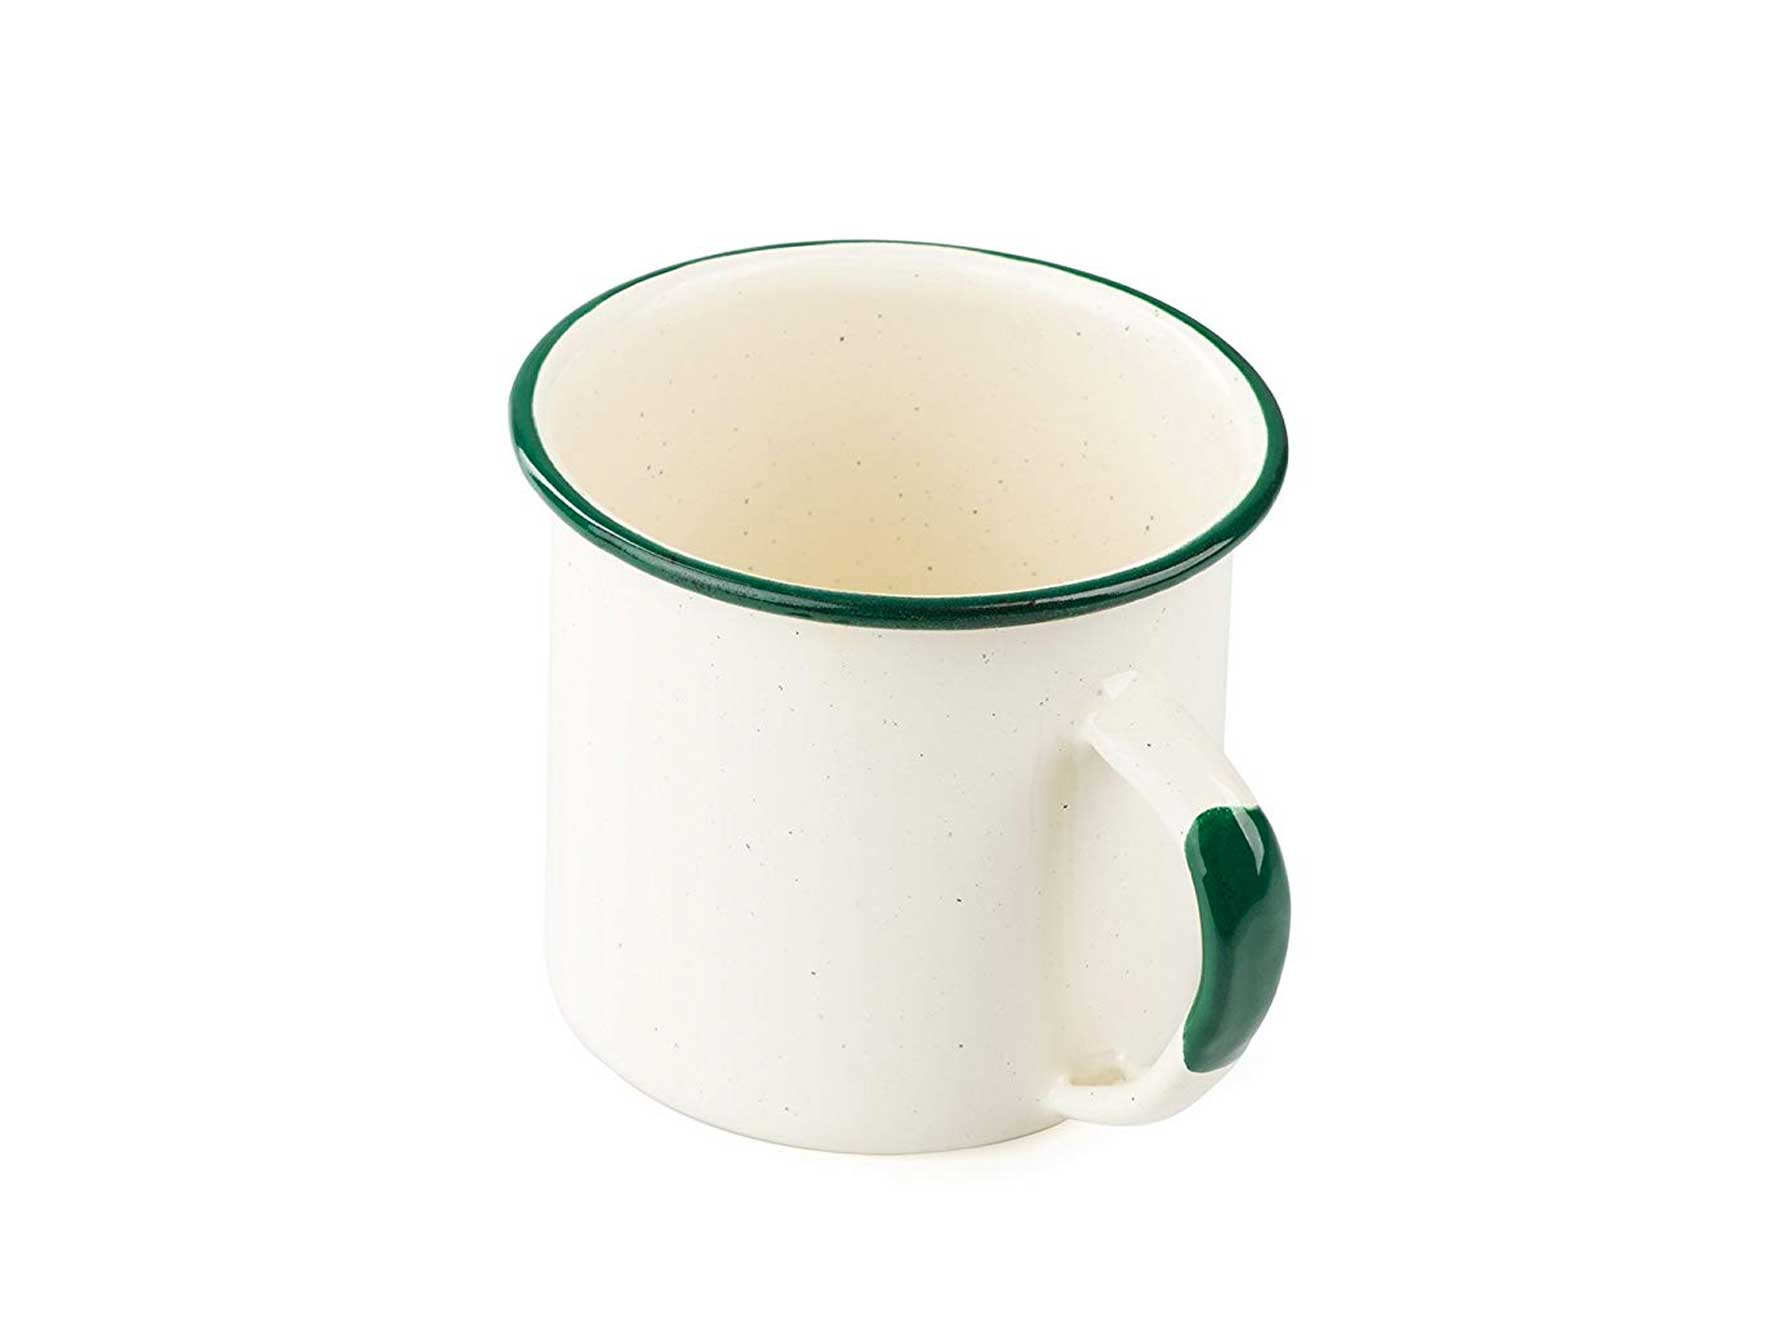 Enamelware mug with green rim and handle